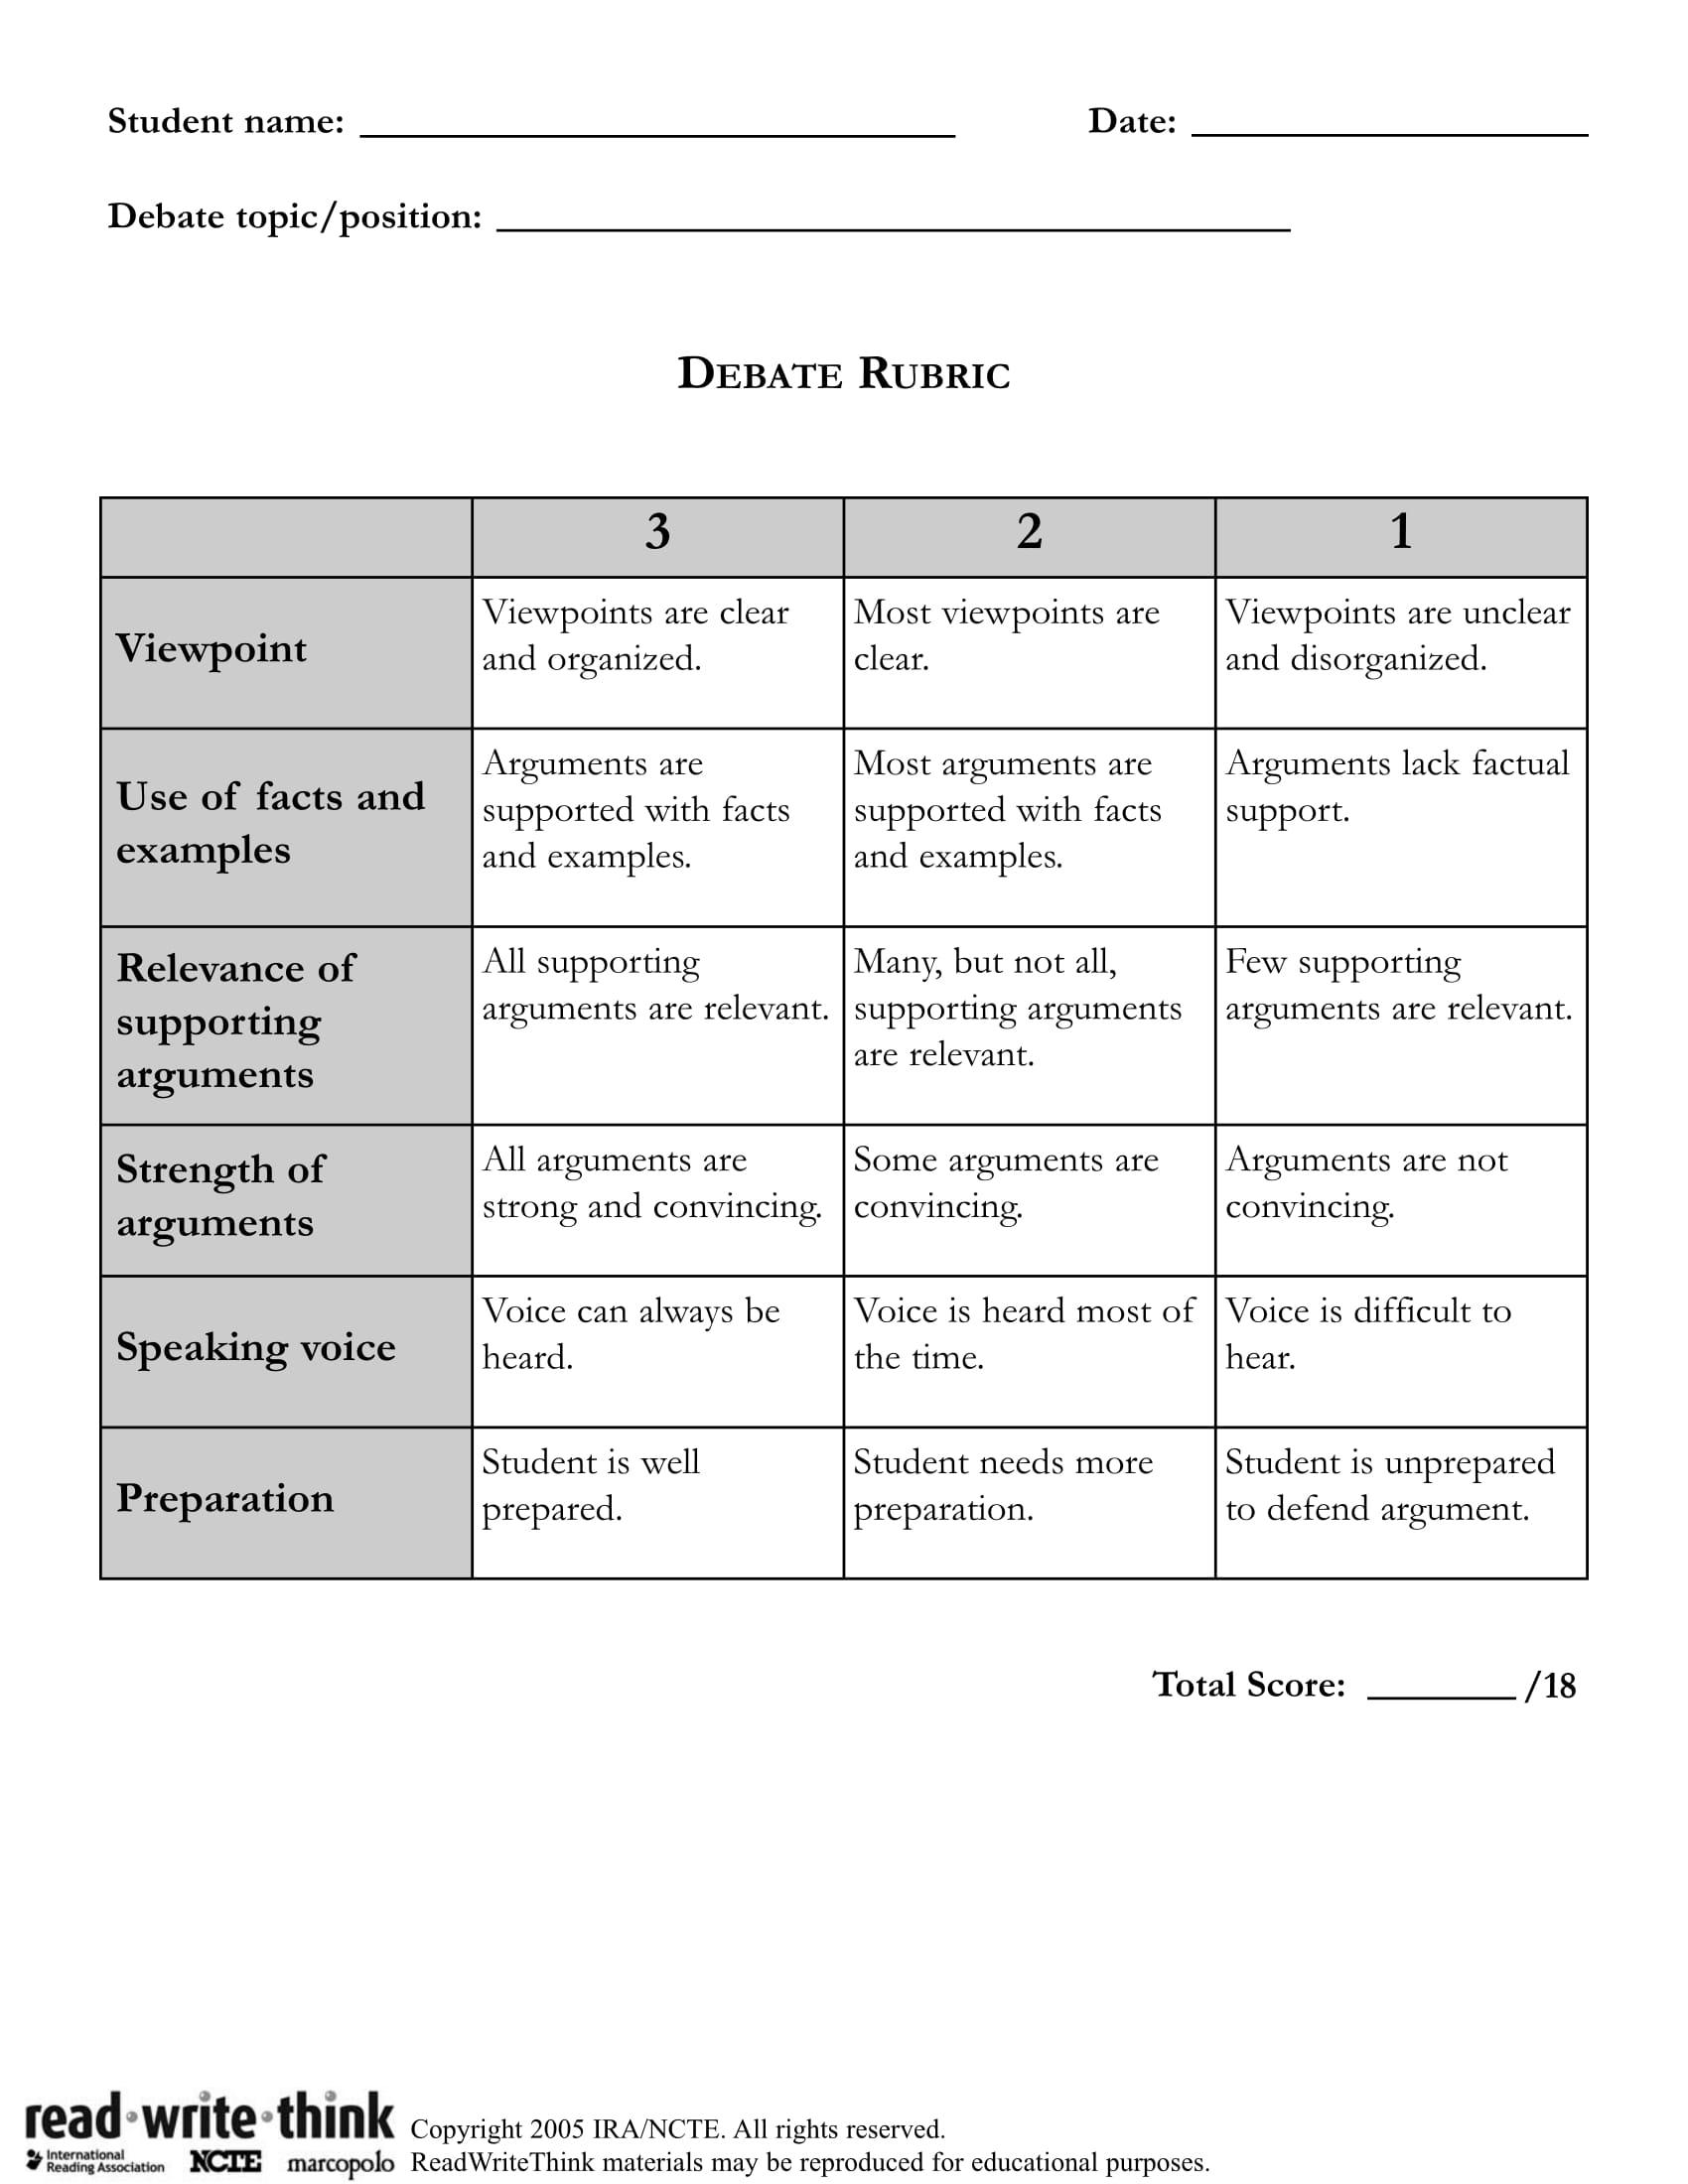 general debate evaluation form 1